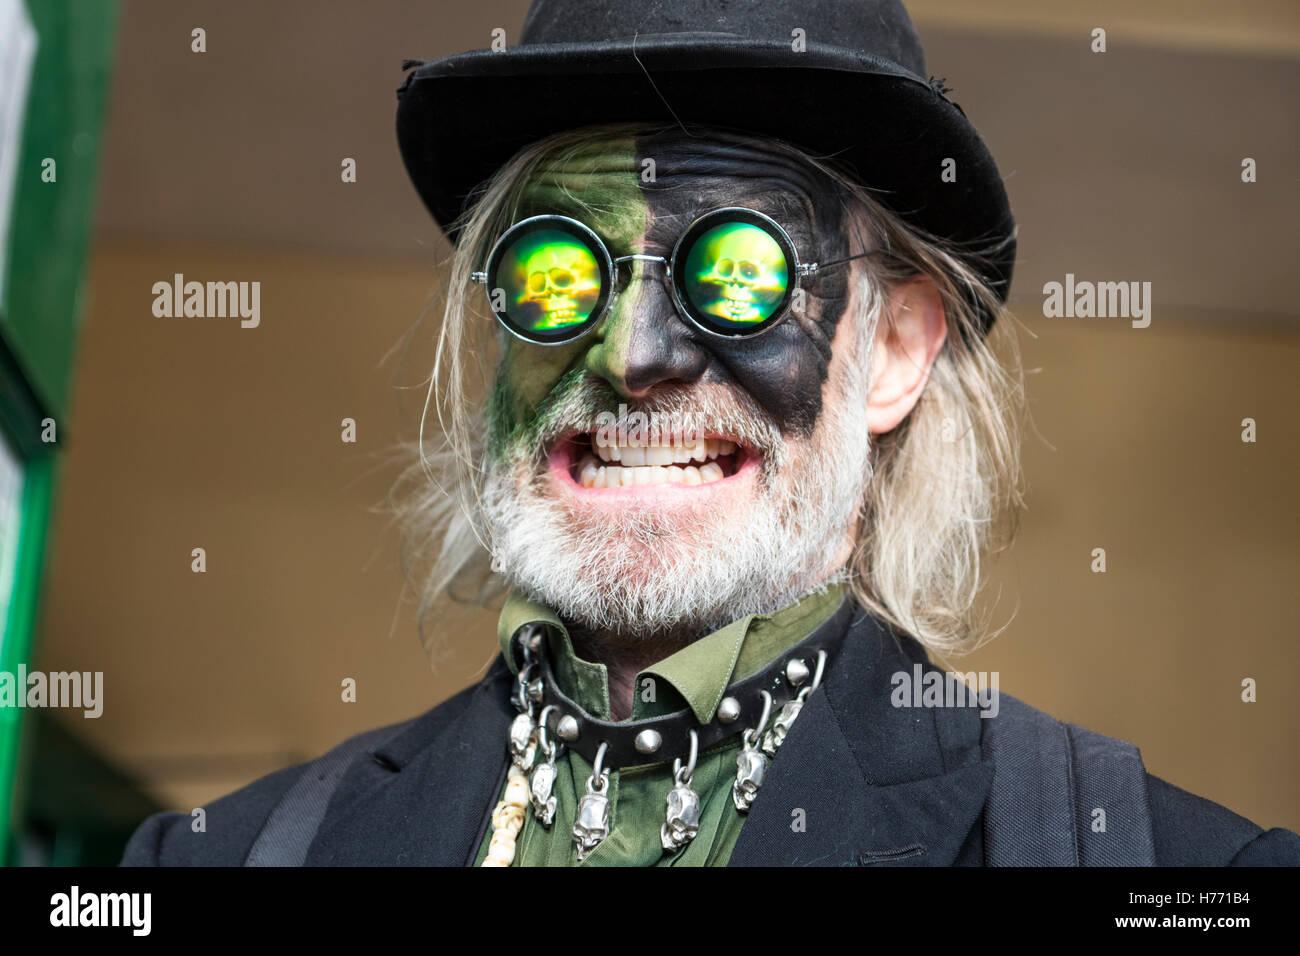 Brooms Bricks and Bowlers Border Morris man. Johnny Morris, face painted black and green, wears hologram sunglasses, - Stock Image